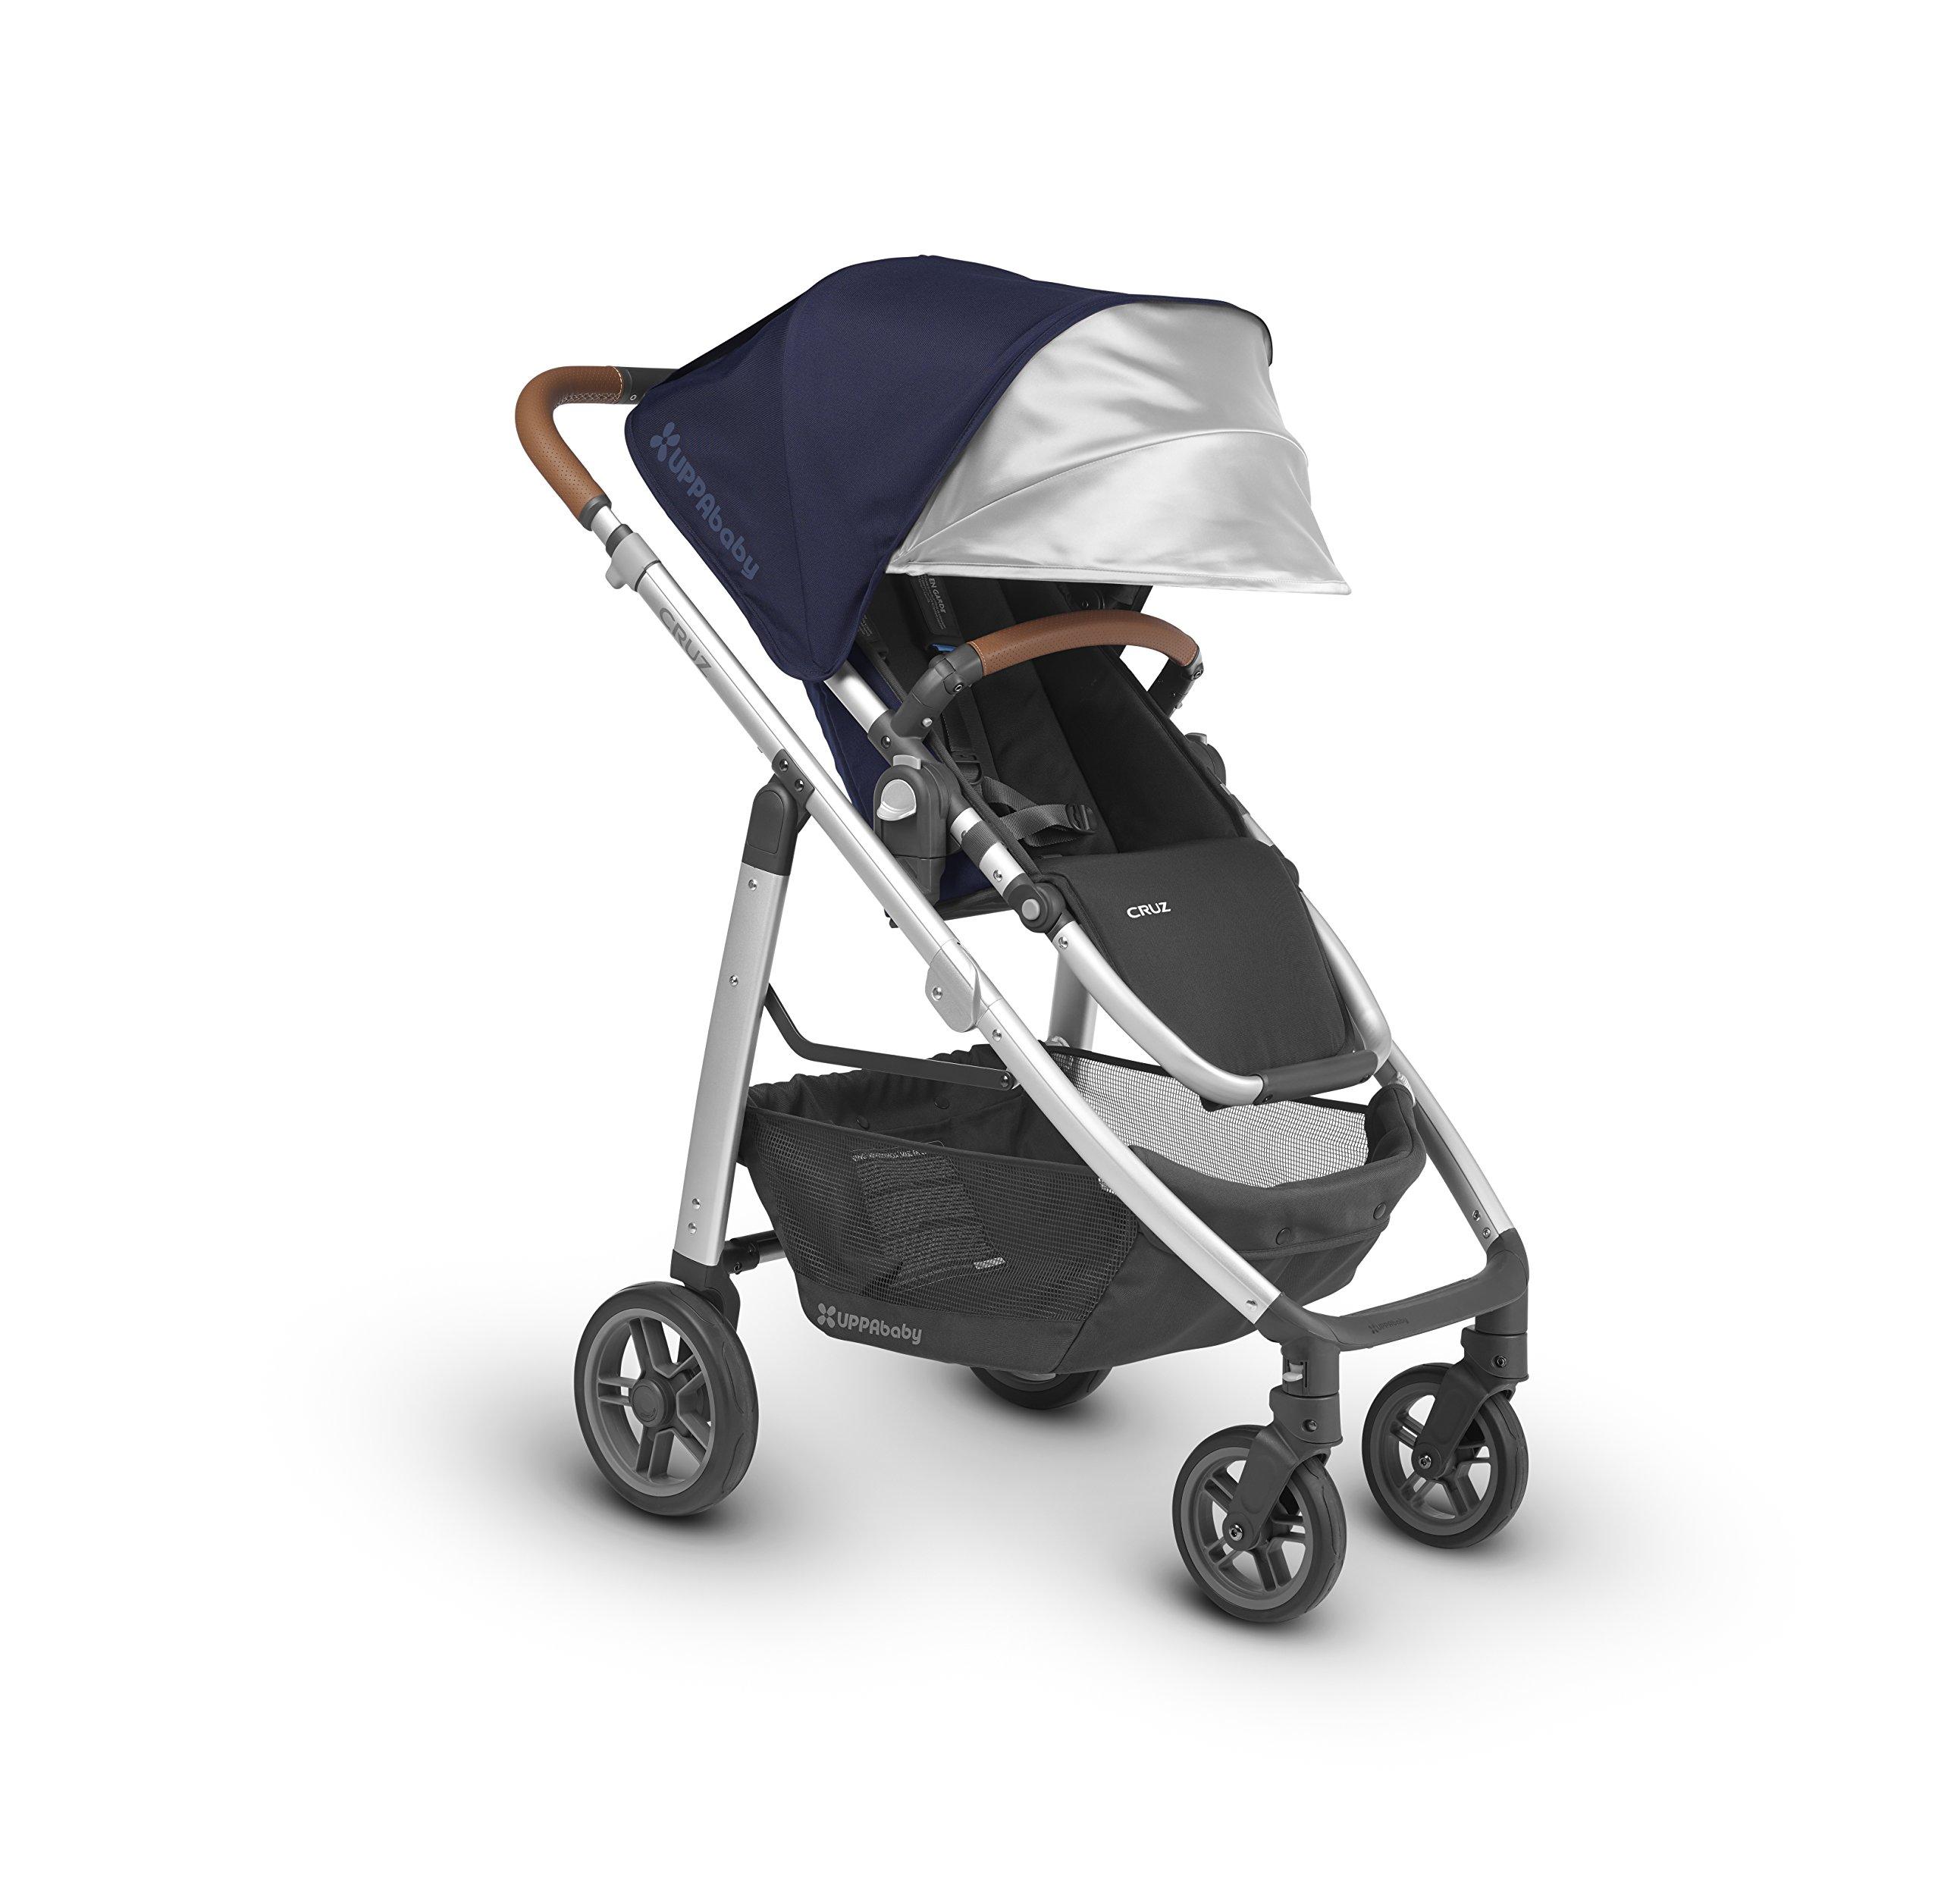 UPPAbaby CRUZ Stroller, Indigo/Silver/Leather, Taylor